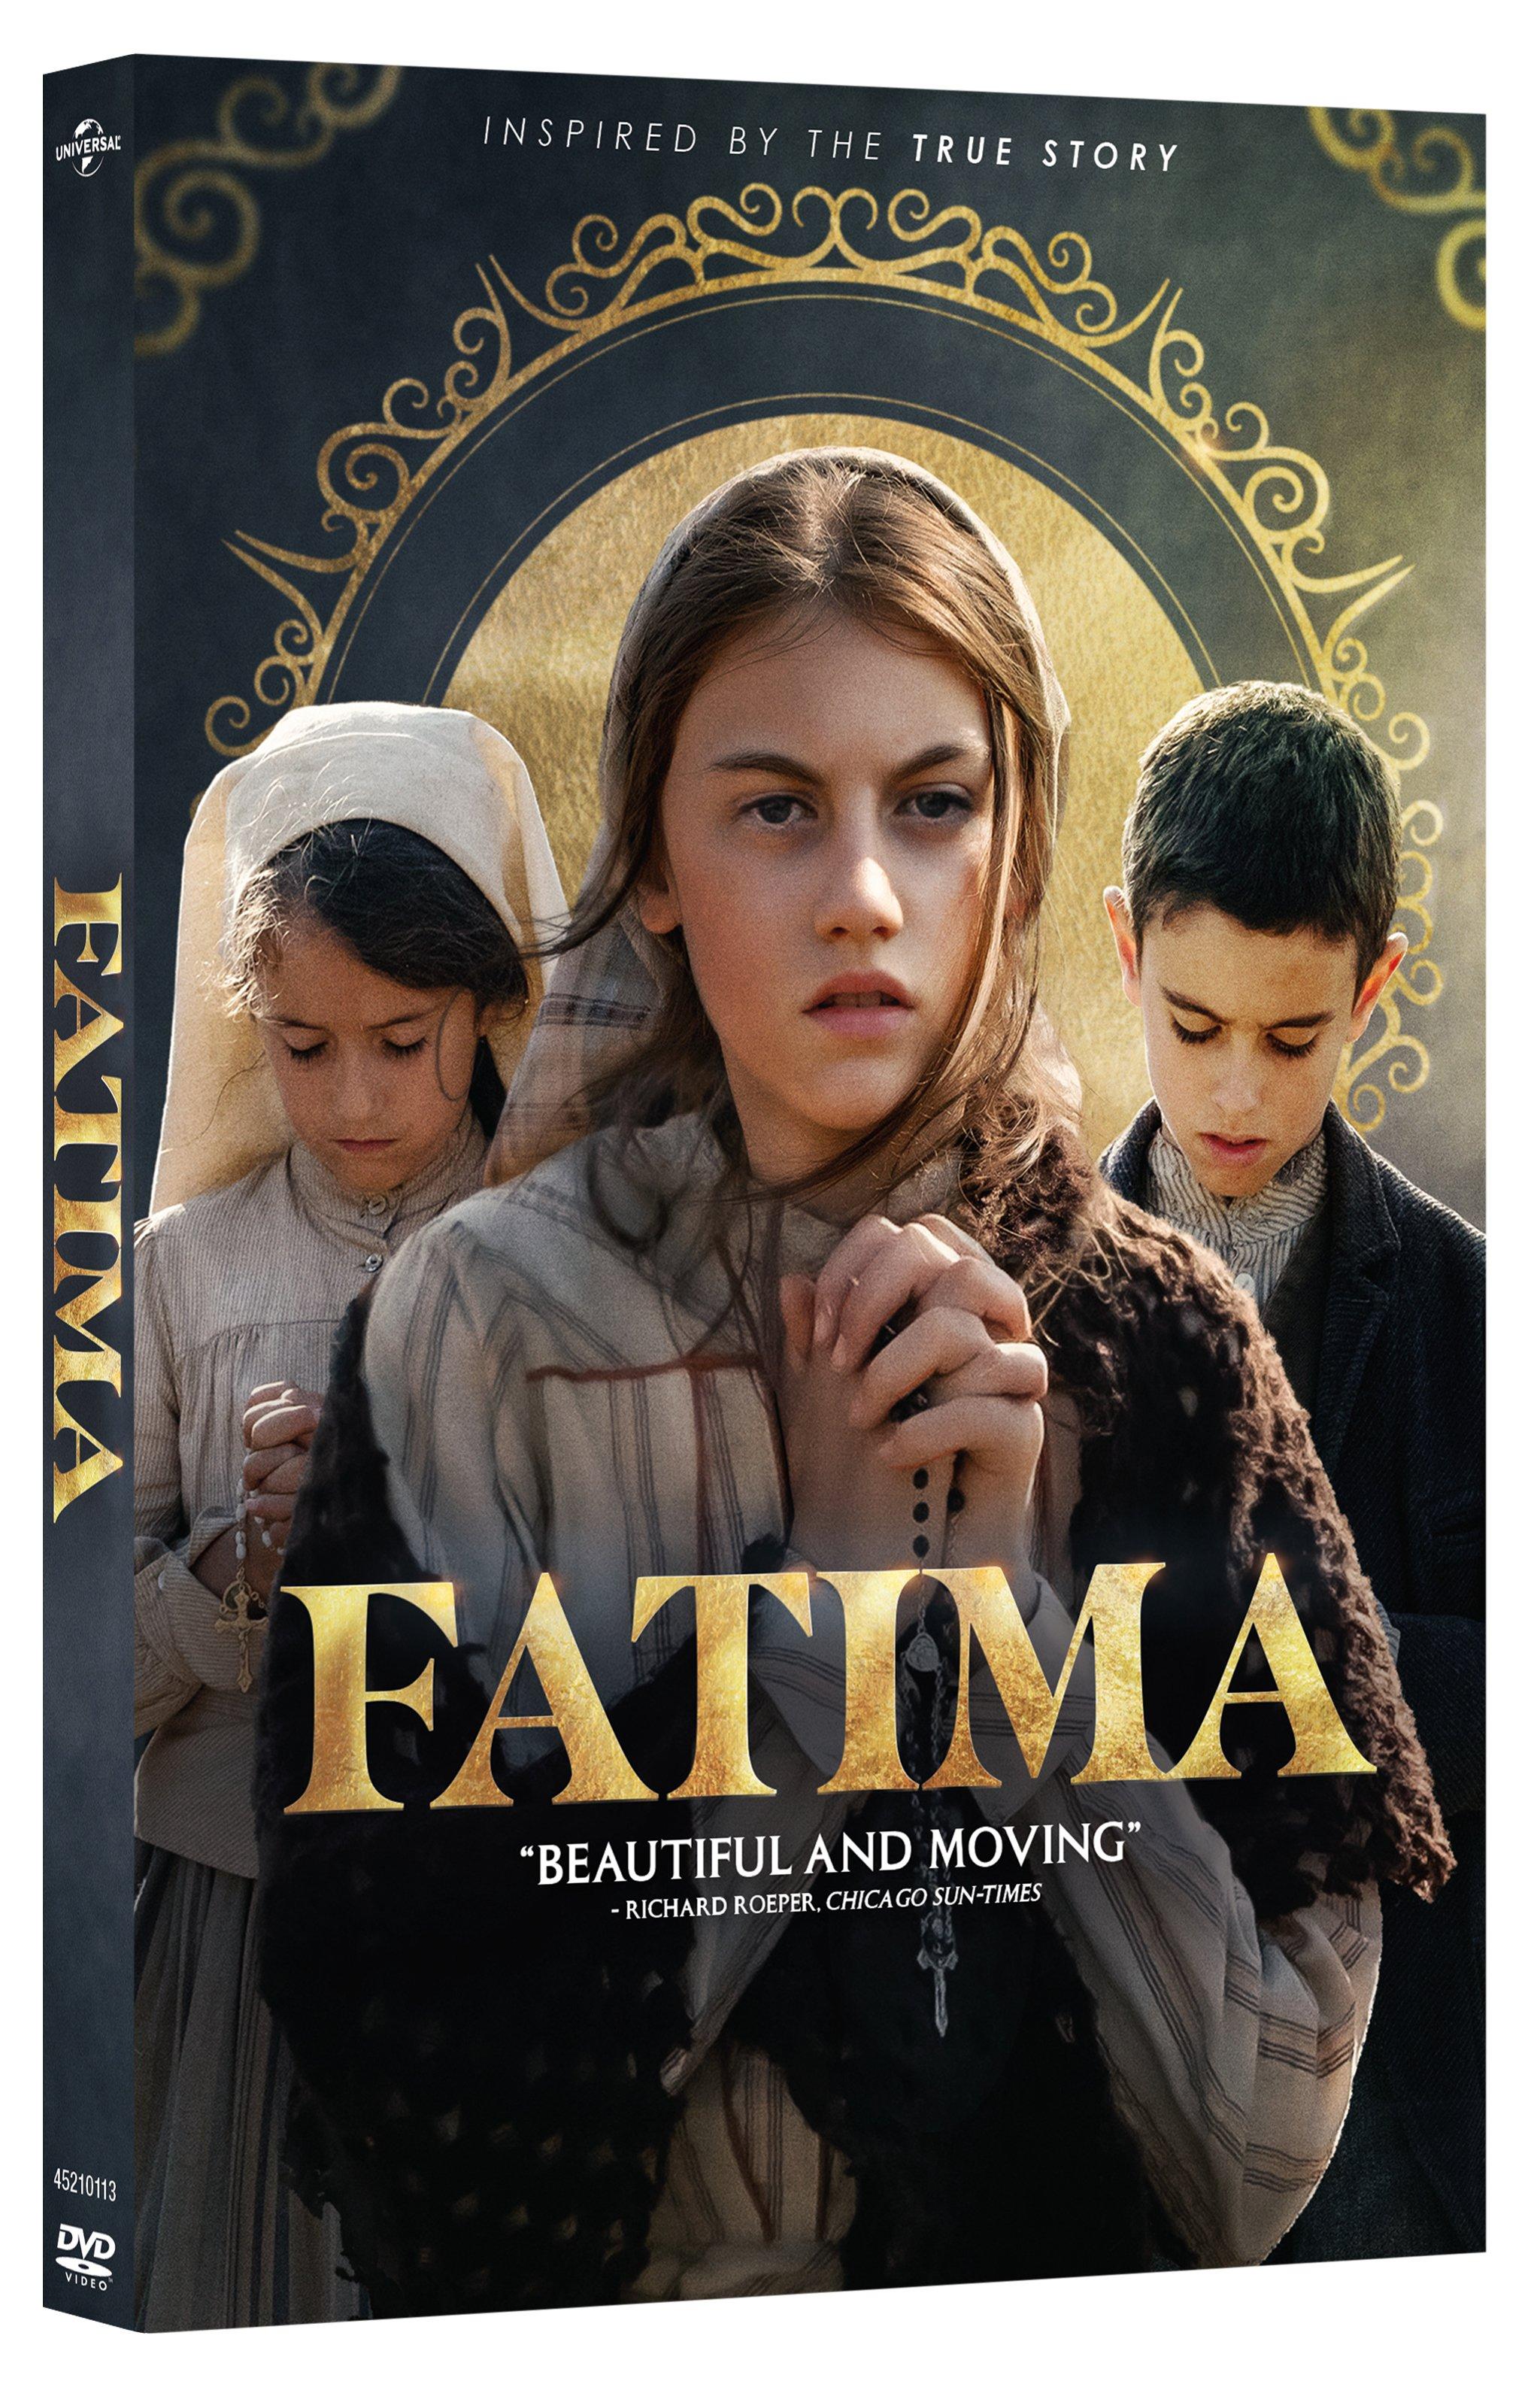 FATIMA_FATIMA_DVD_OCARD_USA_PROD-SHOT_3D